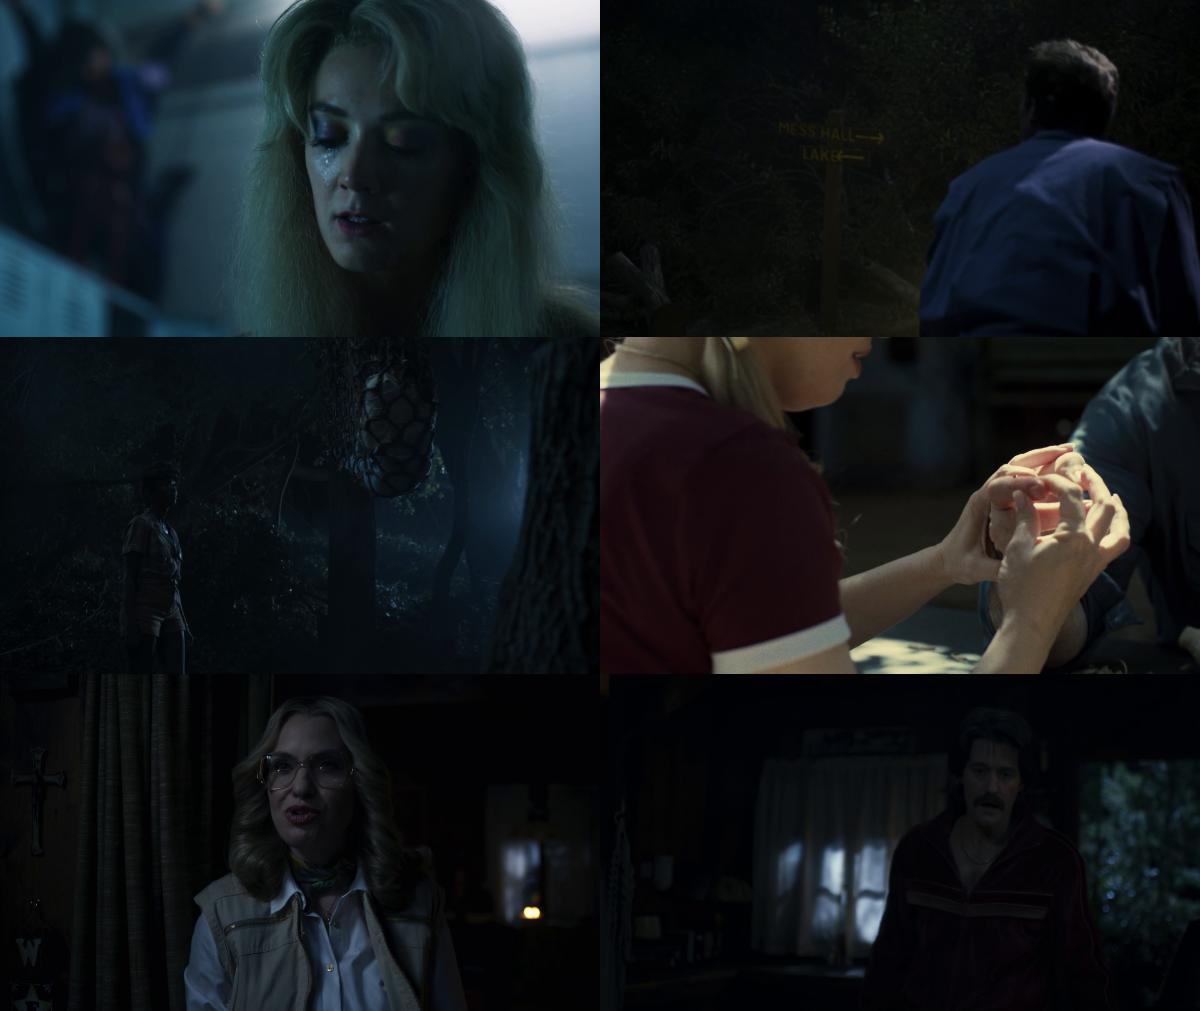 American Horror Story S09E04 True Killers 1080p AMZN WEBRip DDP5 1 x264 AJP69